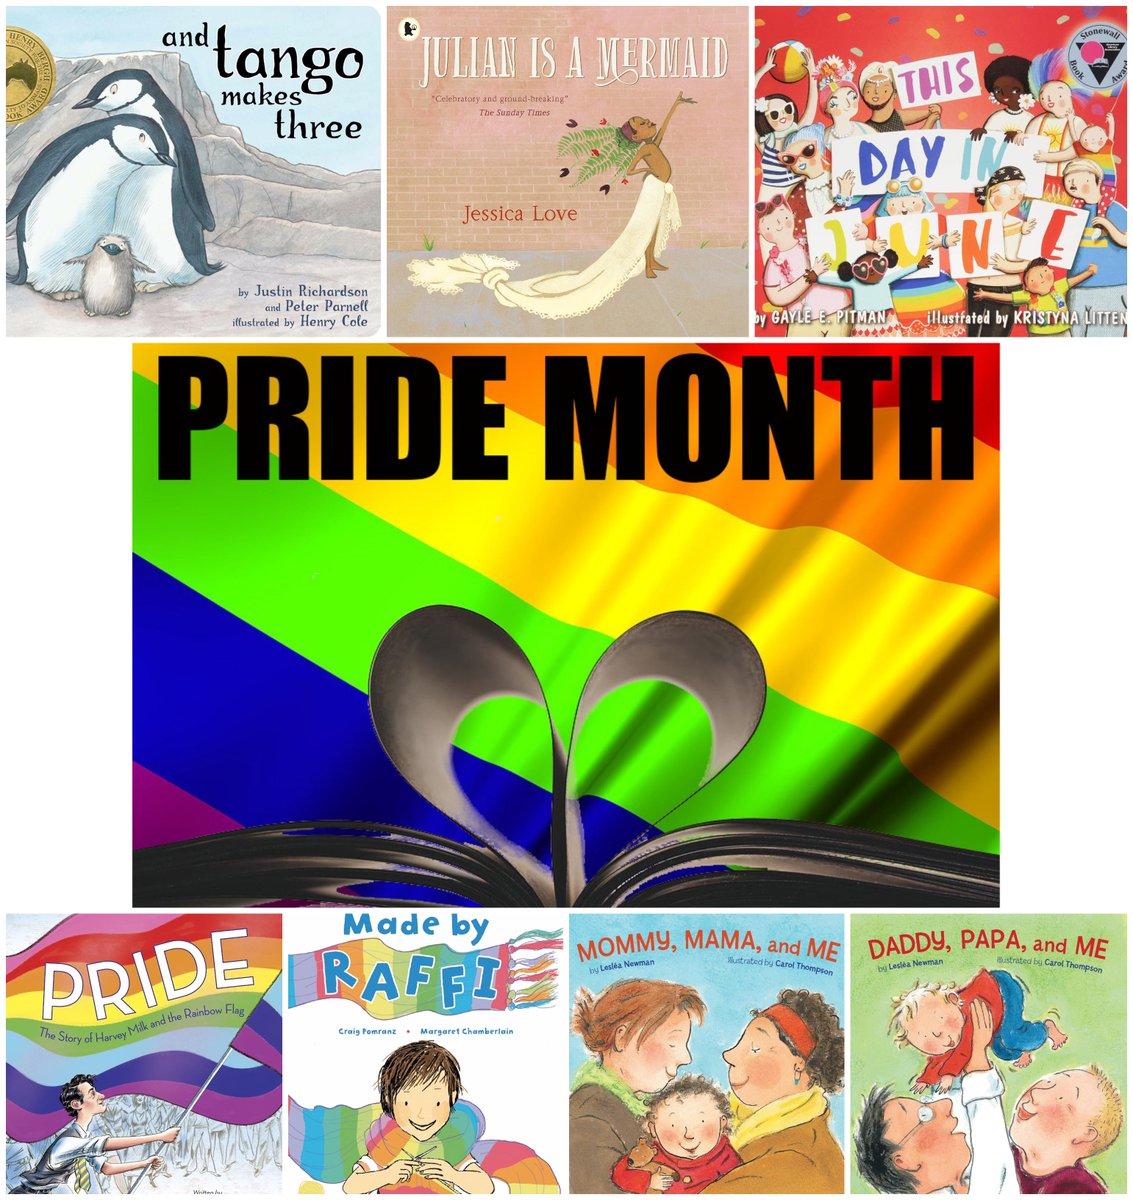 LGBT Pride Books for Children #InternationalChildrensBookDay https://wp.me/p5l5eh-1xr  Note: Books were originally shared for #PrideMonthpic.twitter.com/Dnz4u3nWVv